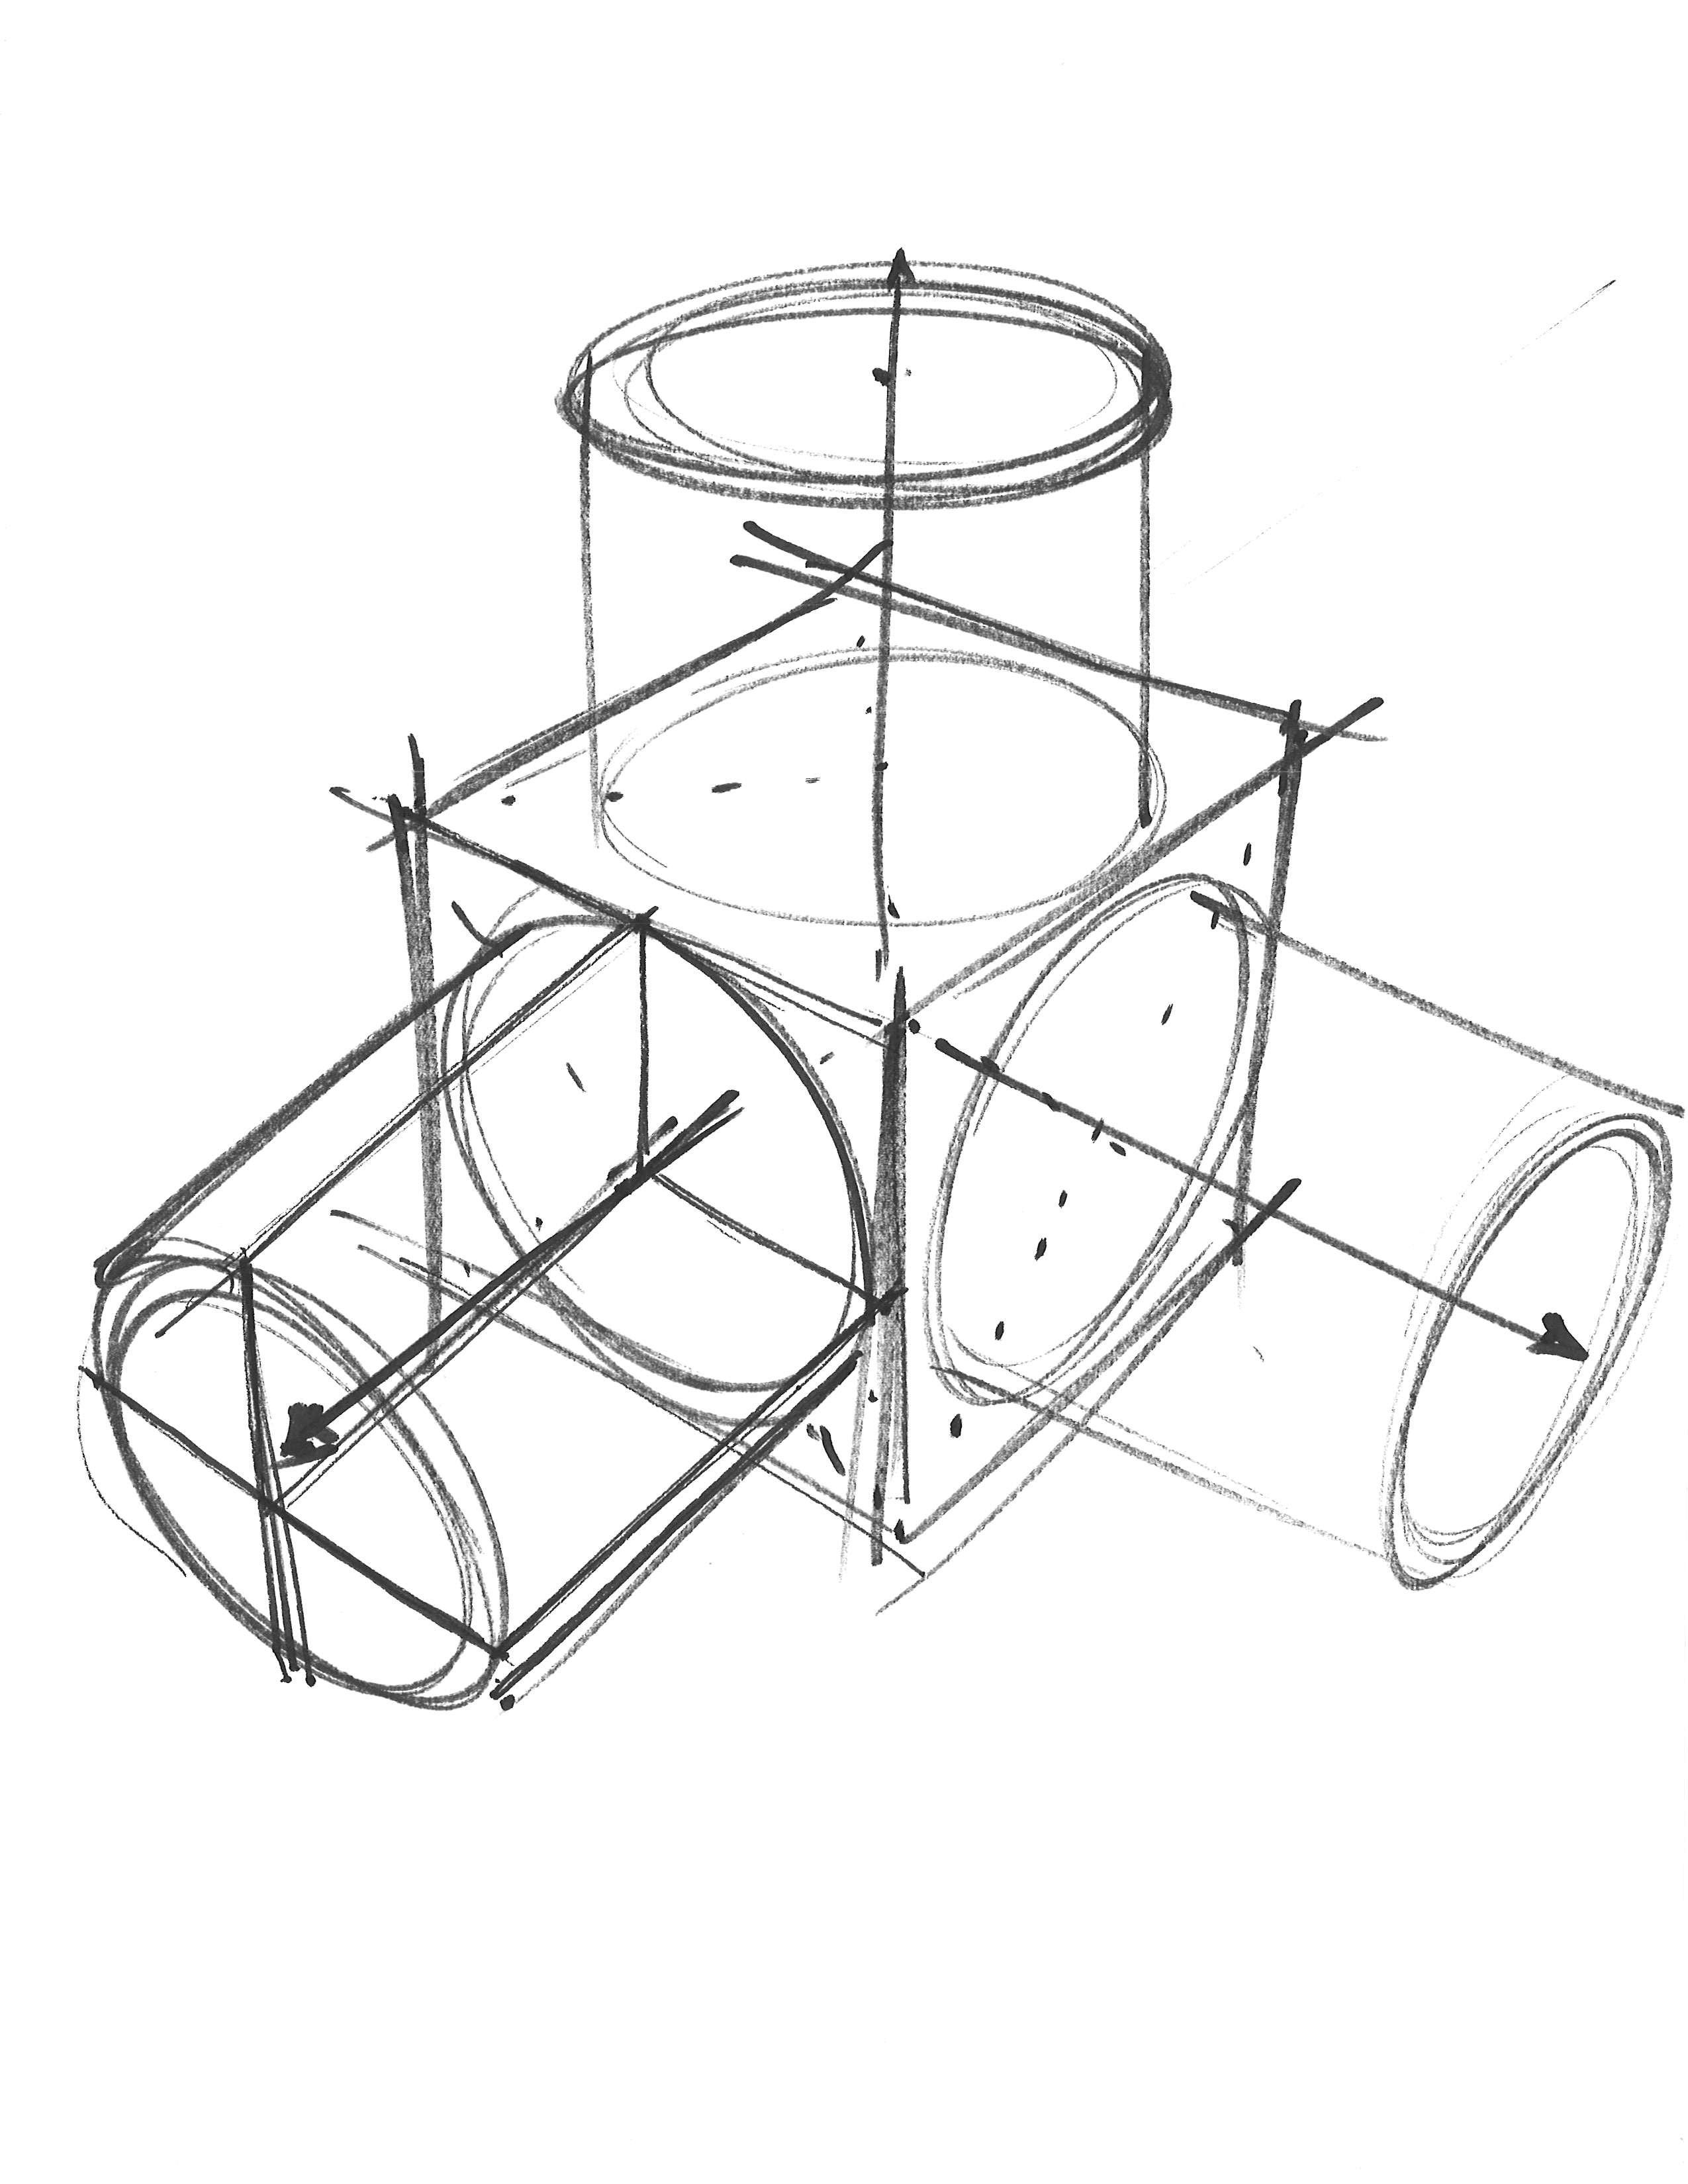 2550x3300 37025702 Concept Sketching Amp Rendering